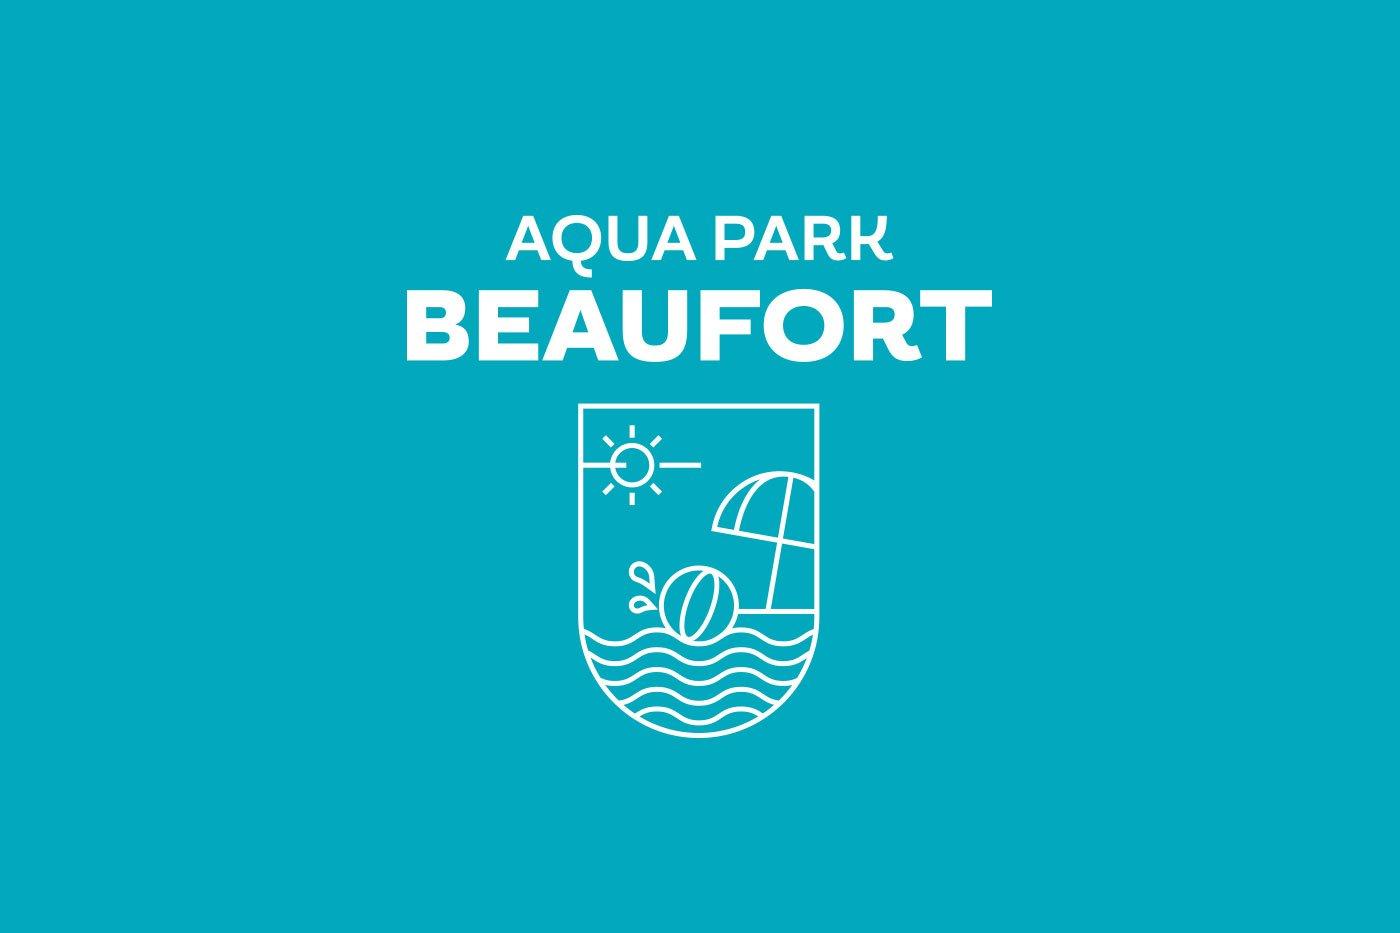 https://duktor.lu/wp-content/uploads/2020/10/duktor-projekt-visit-beaufort_21-2.jpg